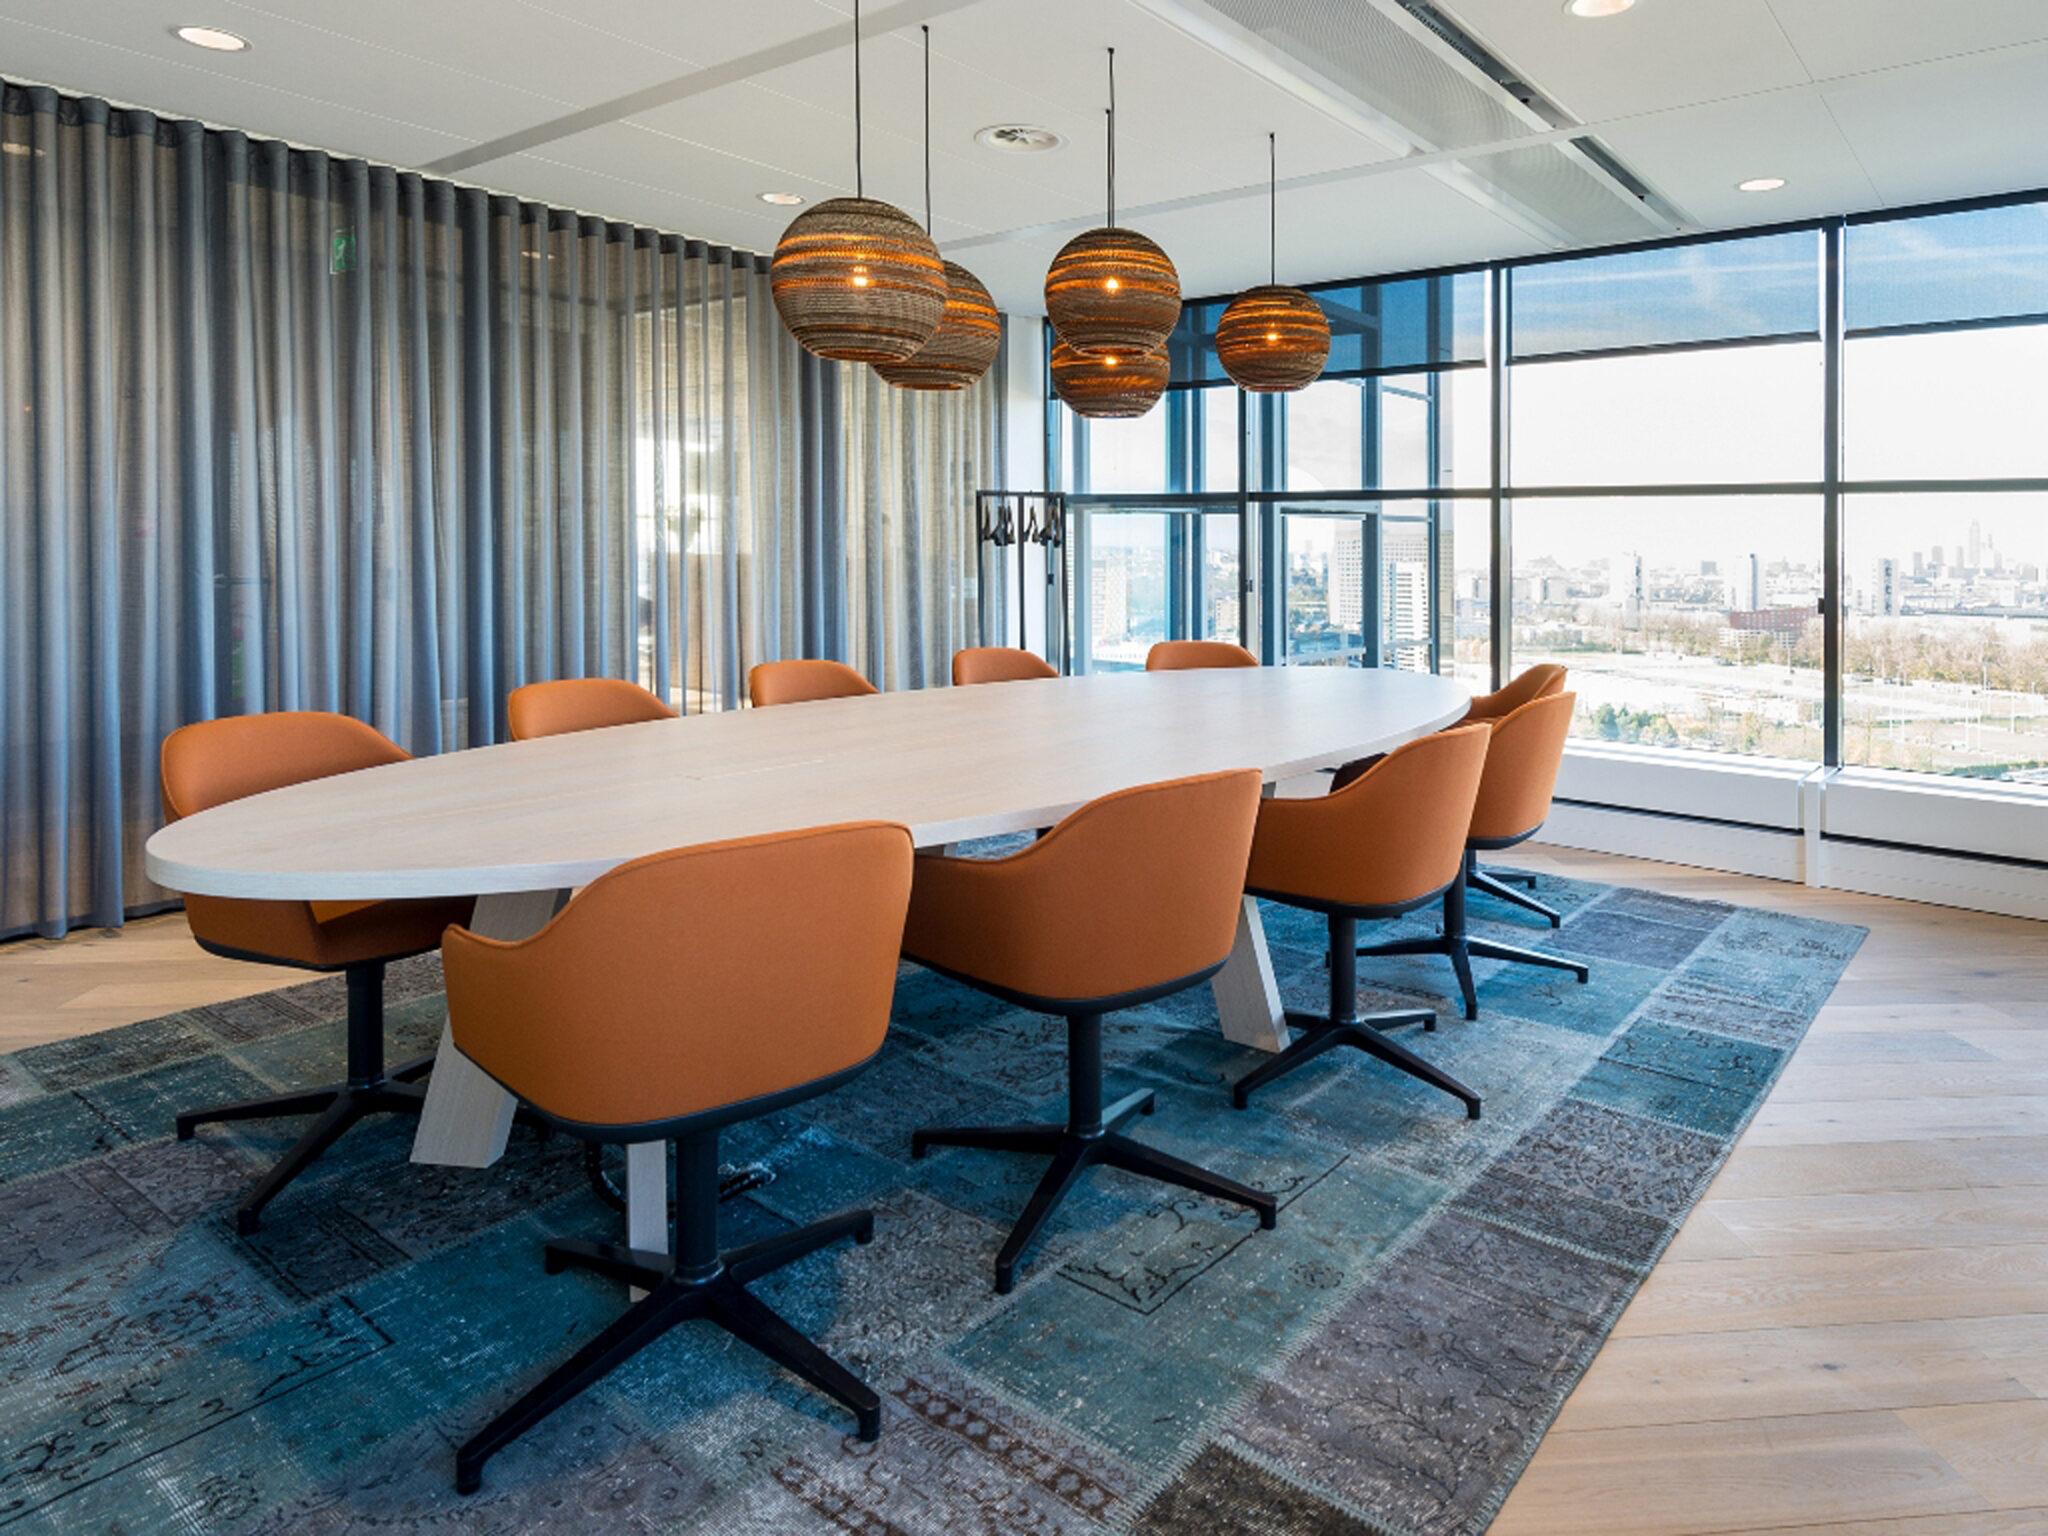 Castelijn vergadermeubilair - vergadertafel Heering Office Den Haag